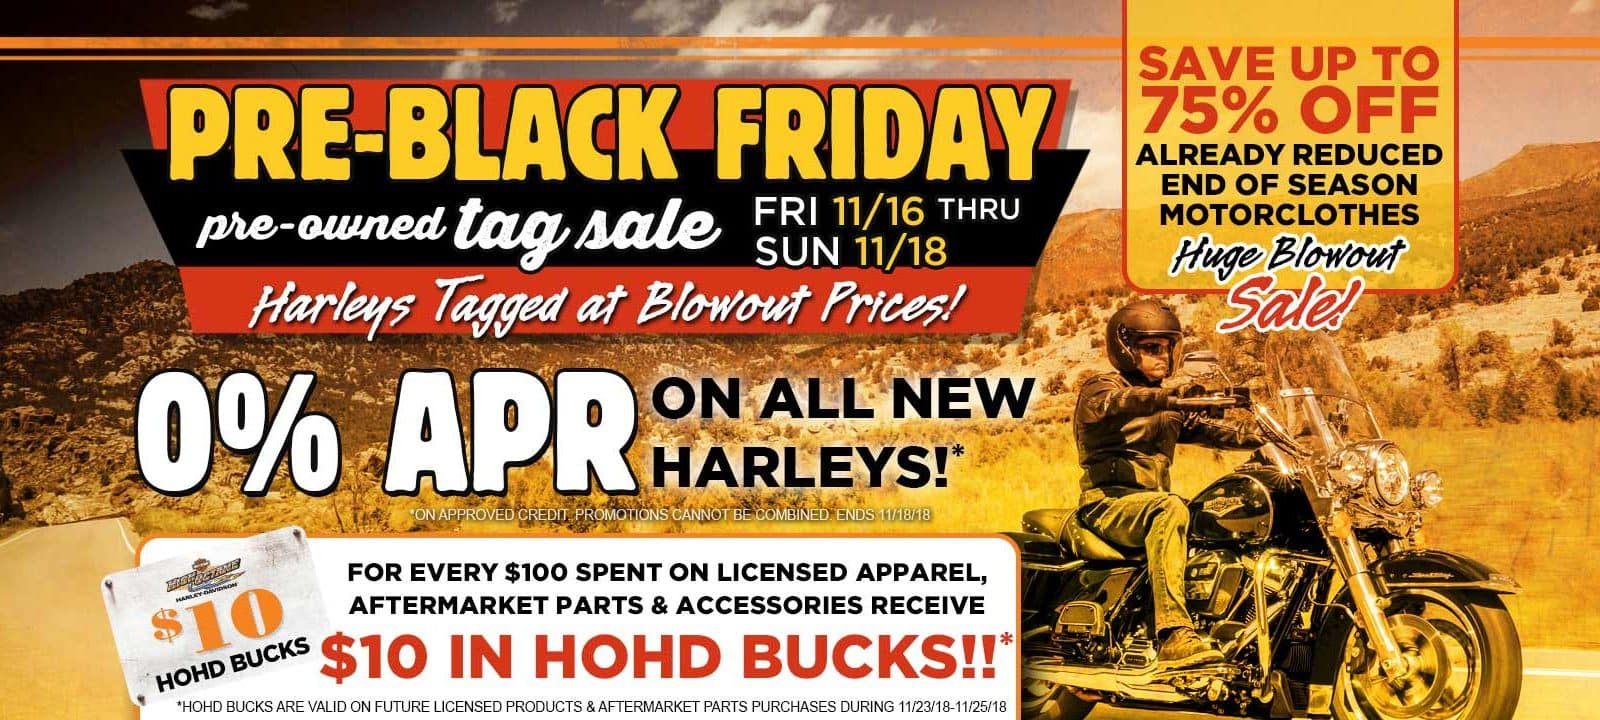 20181112-HOHD-1800x720-Pre-Black-Friday-Sale-0-APR